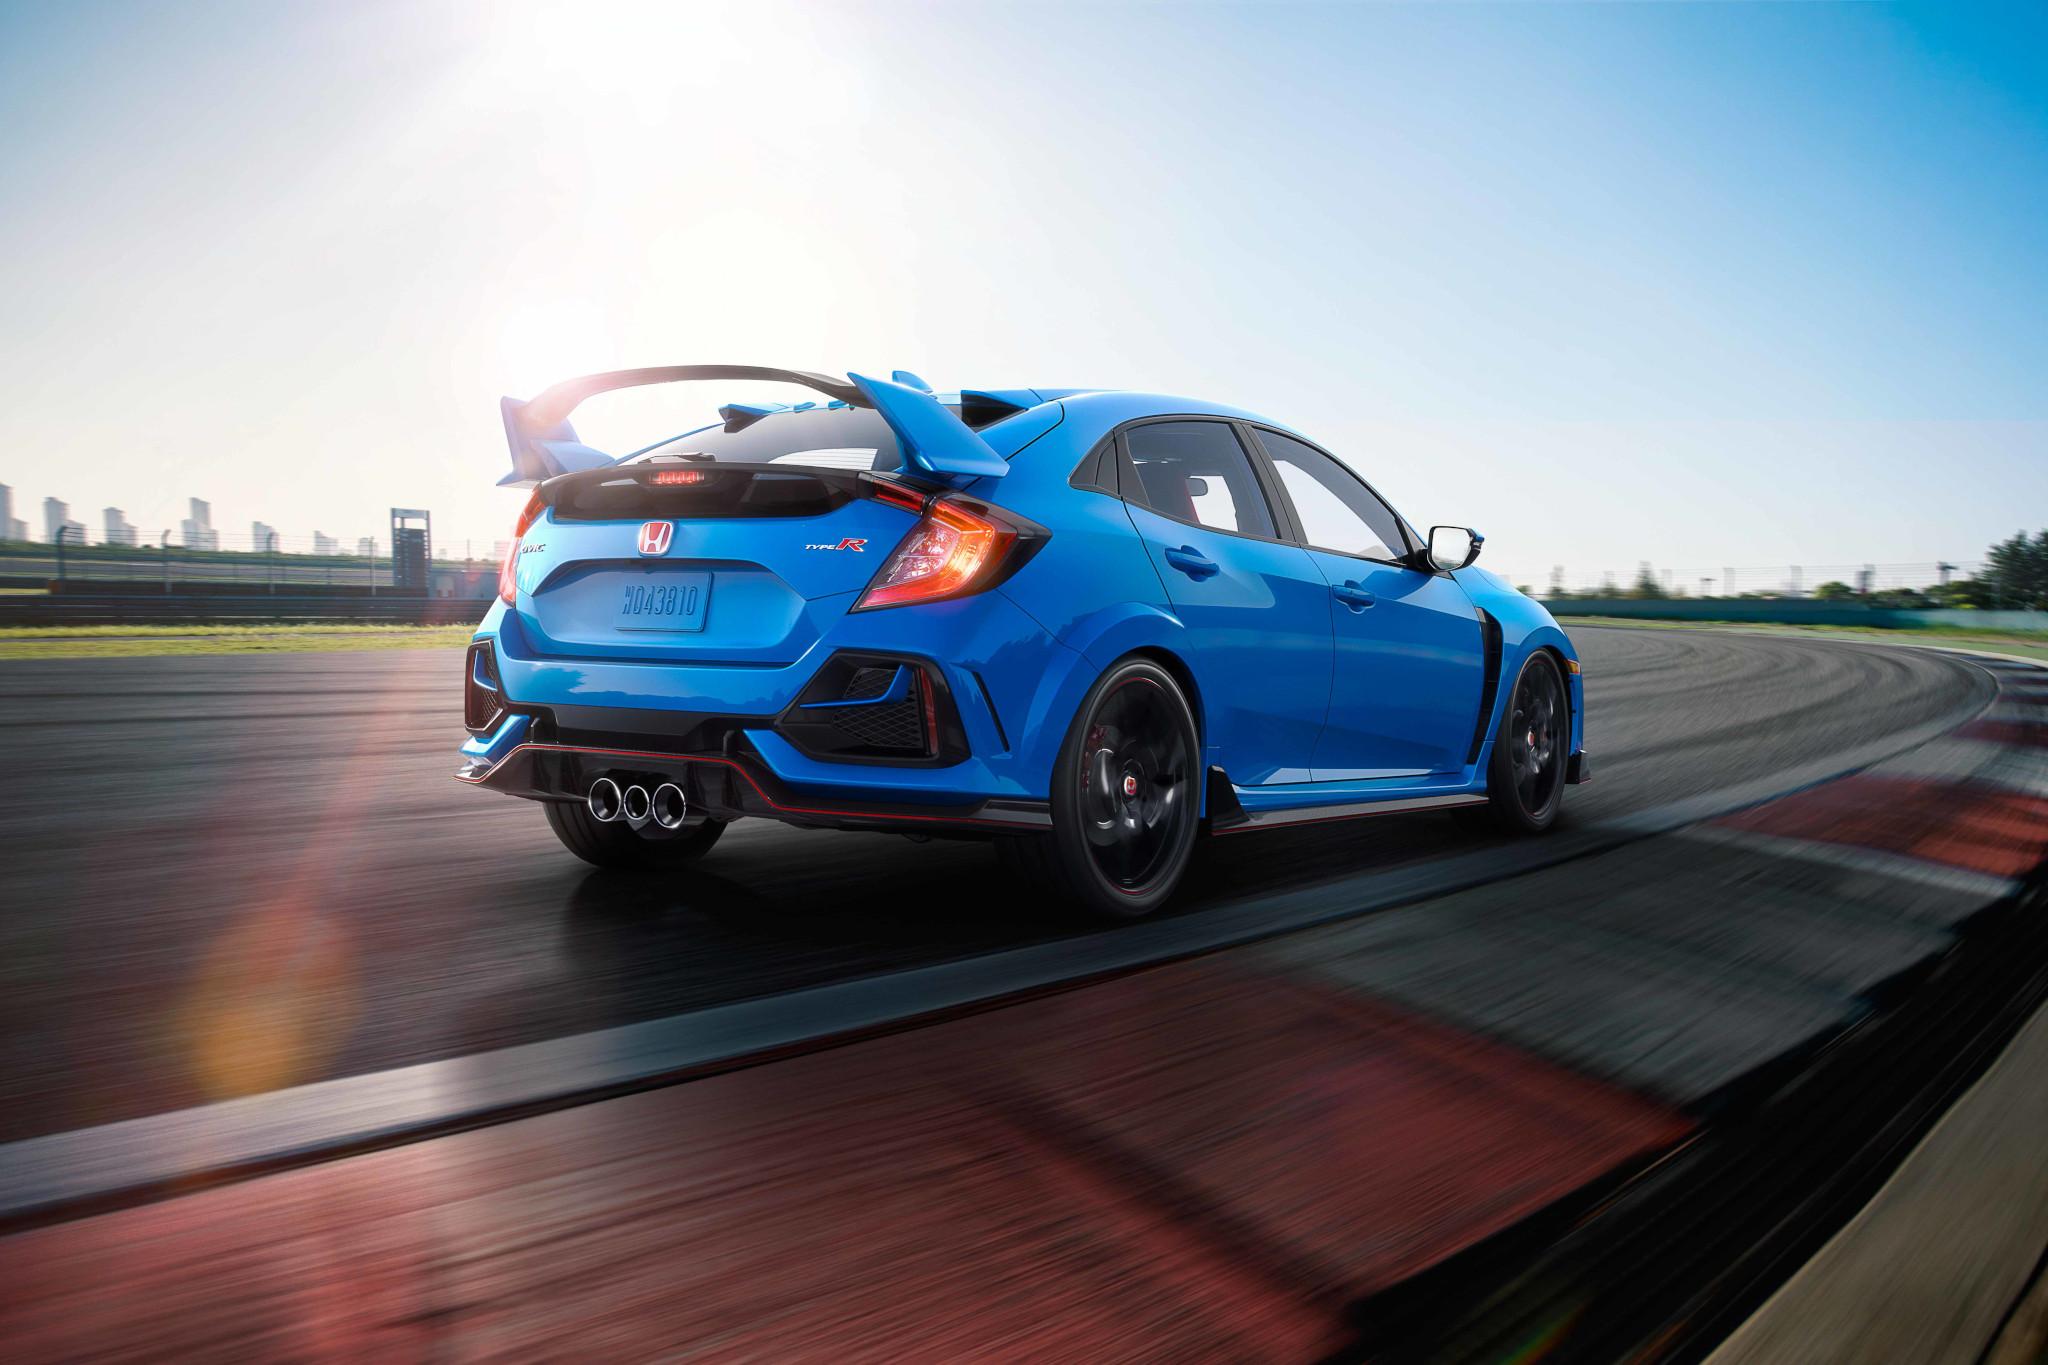 honda-civic-type-r-2020-04-angle--blue--dynamic--exterior--rear.jpg